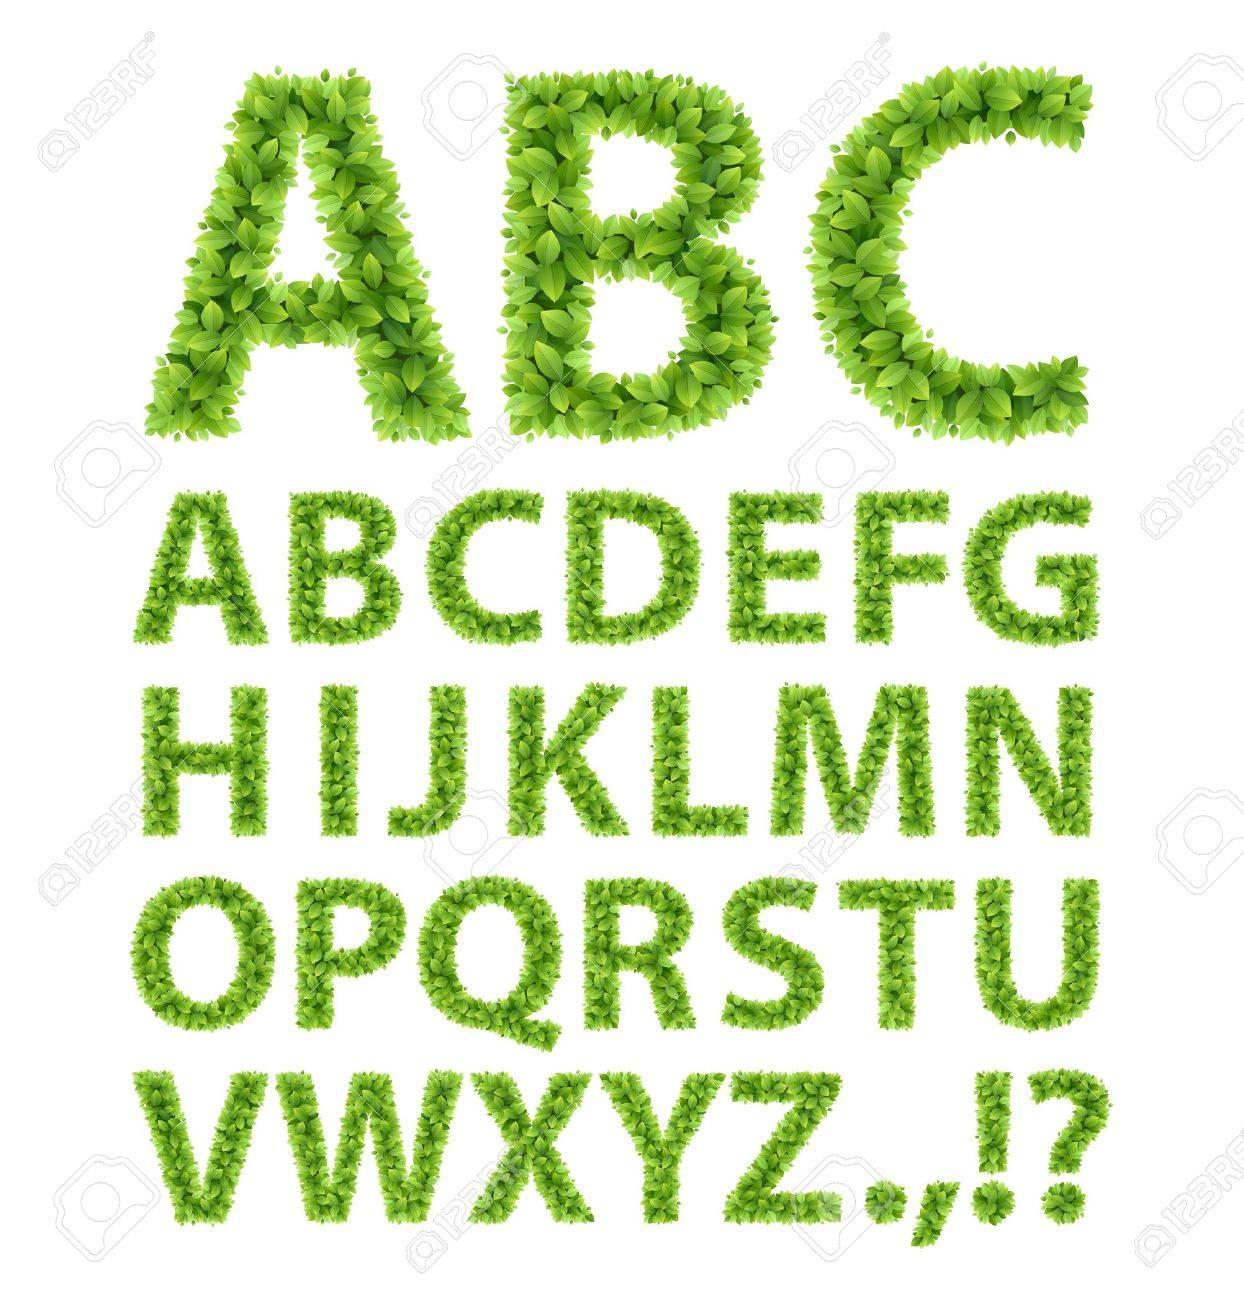 Green Leaves font  Vector illustration Stock Vector - 14749022